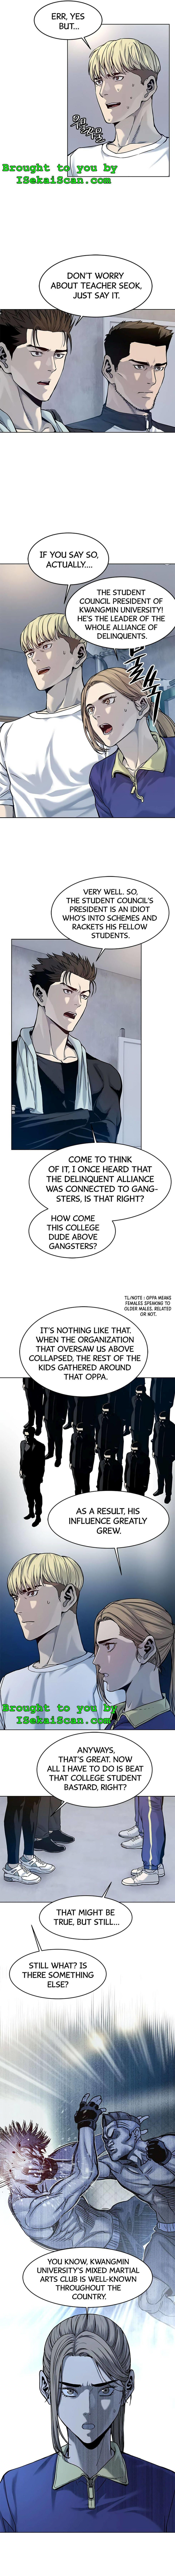 God Of Blackfield Chapter 90 page 11 - Mangakakalots.com